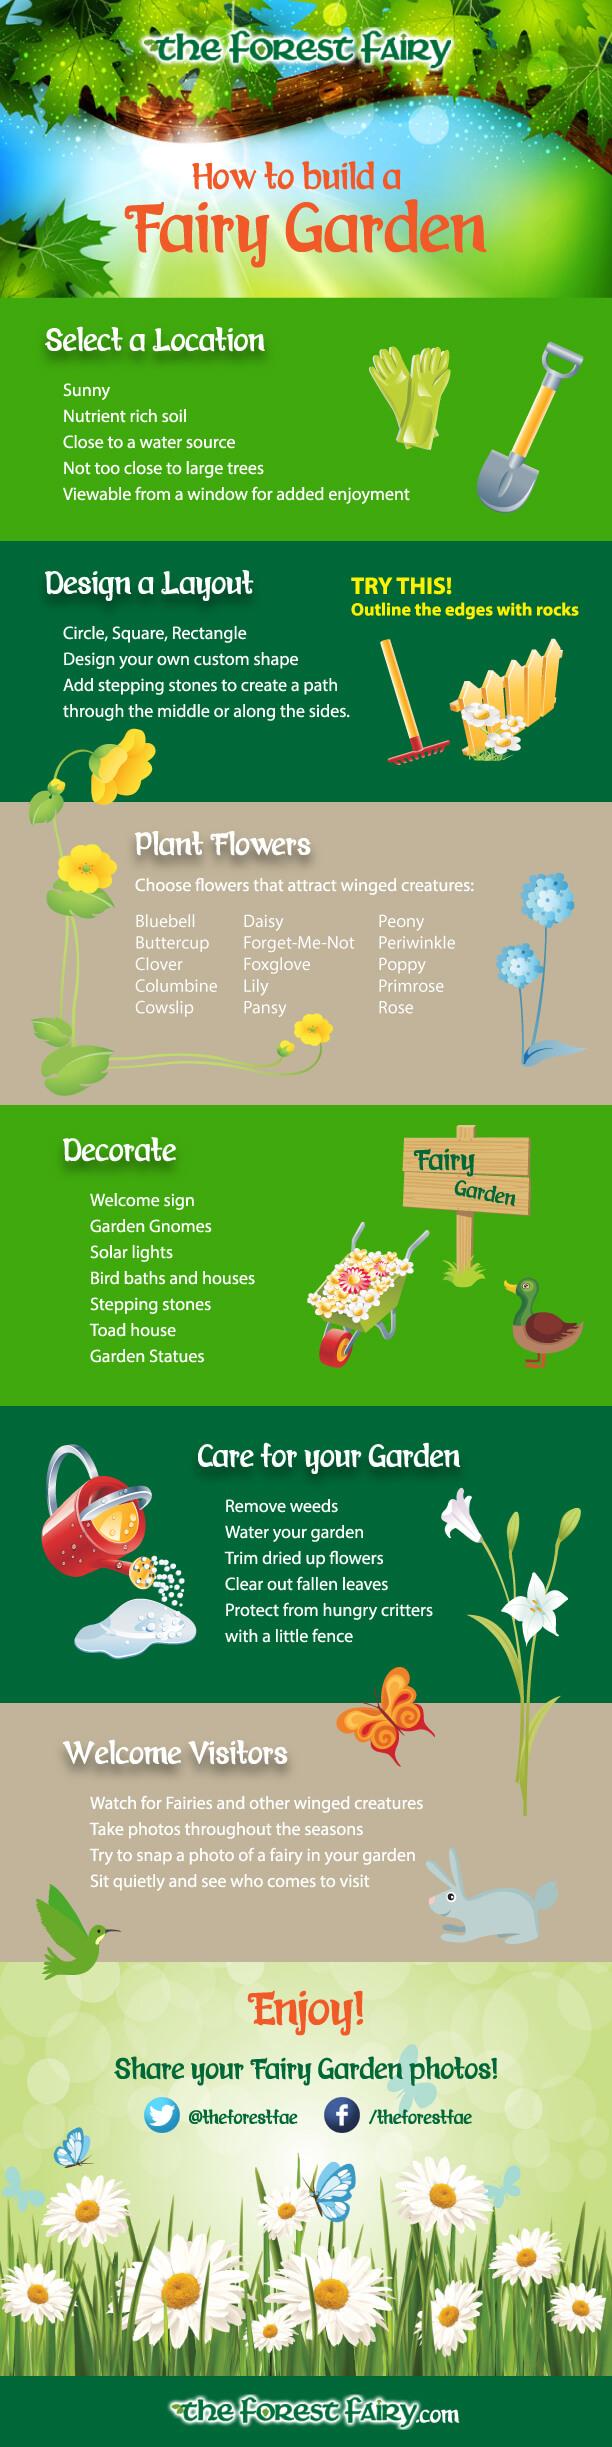 How To Build A Fairy Garden | The Forest Fairy